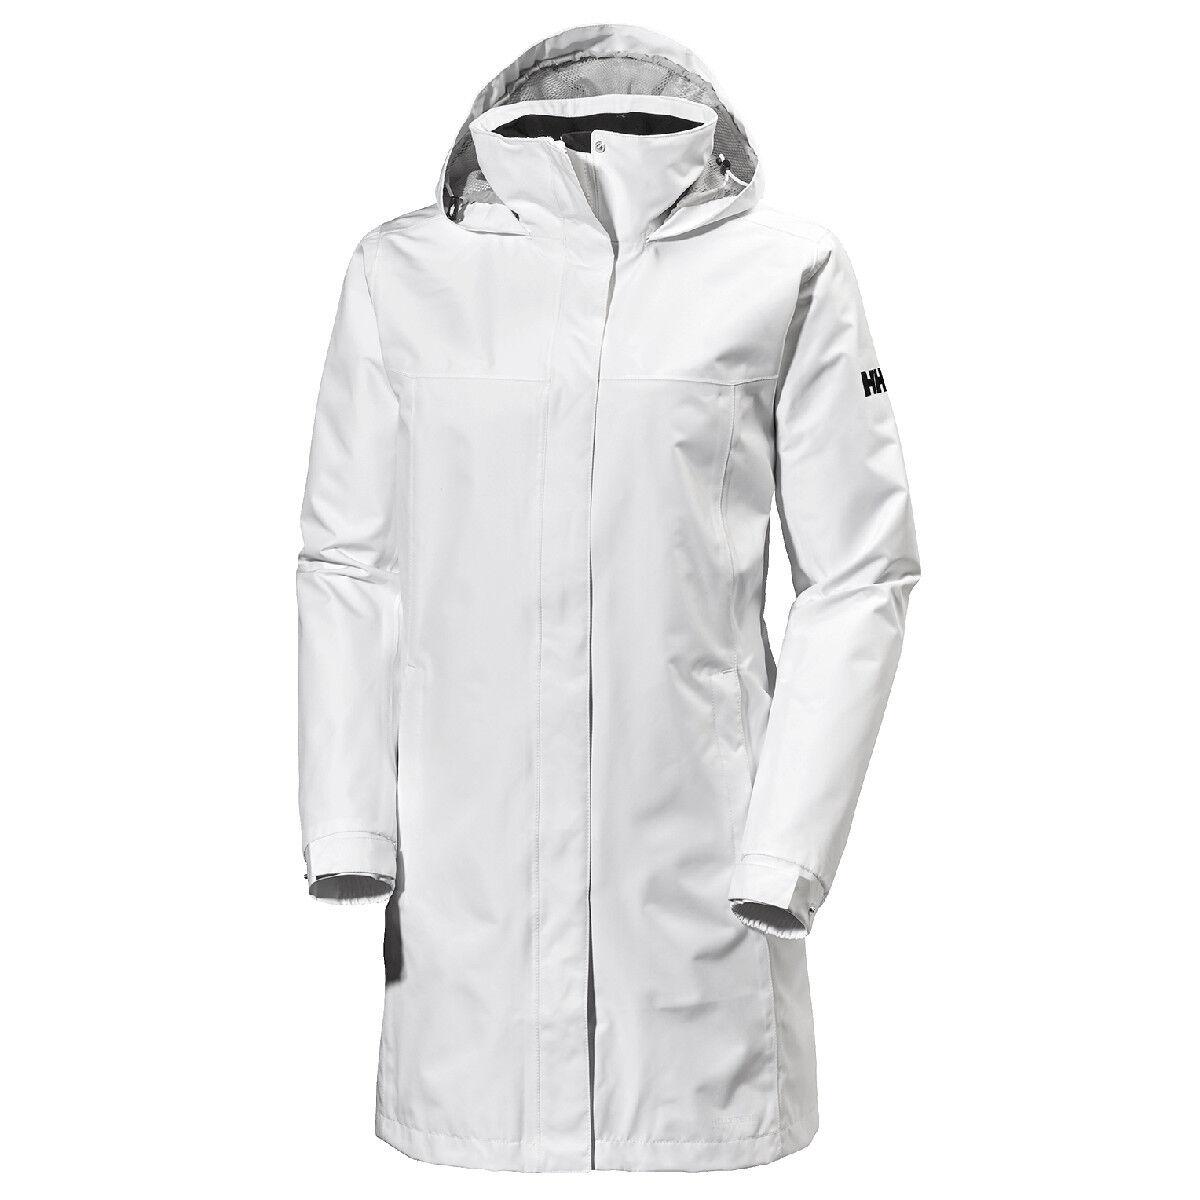 Helly Hansen Women's Aden Long Rain Jacket